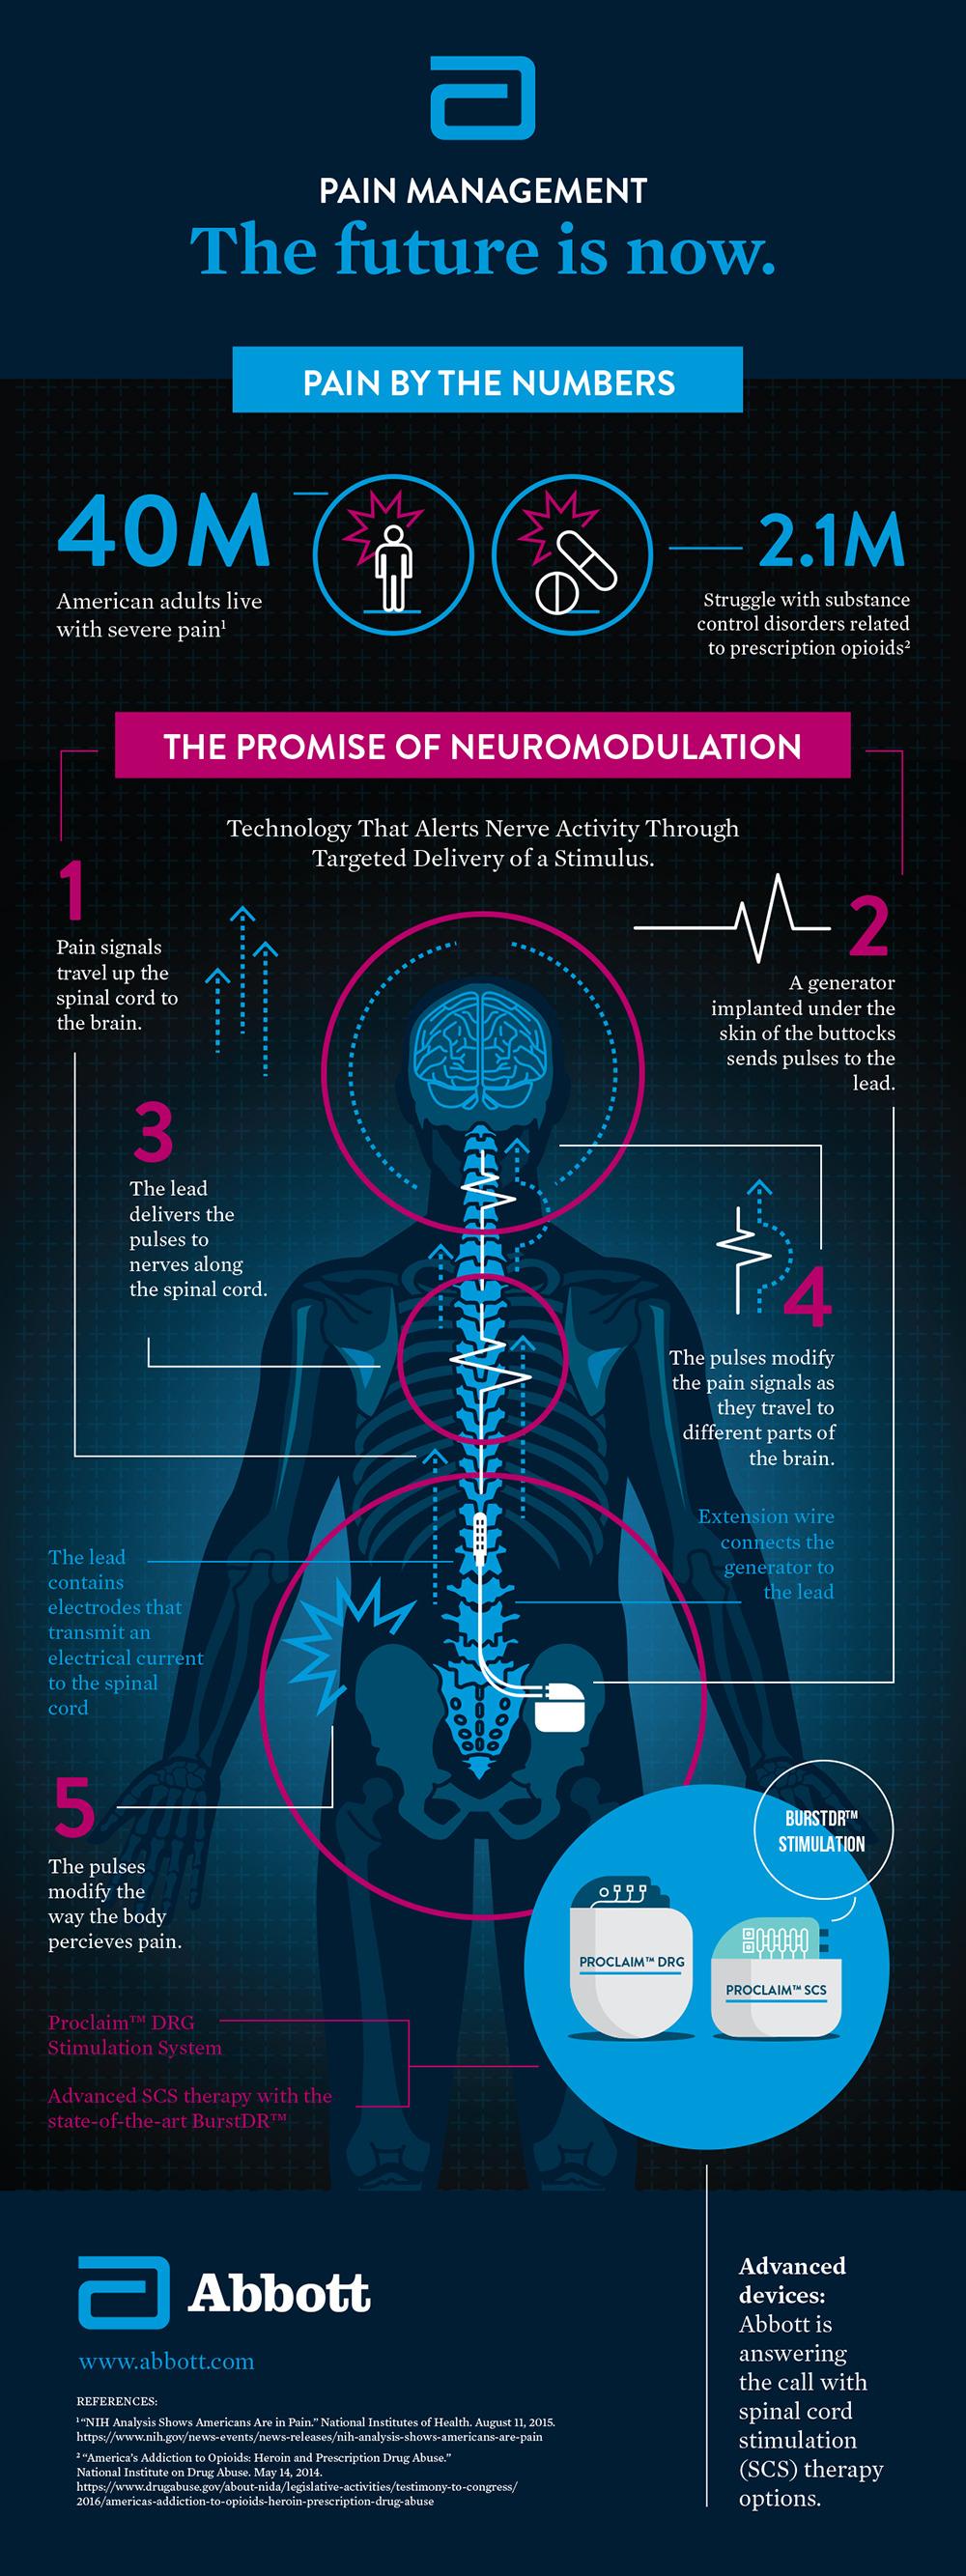 Abbott_Pain-Management-Infographic